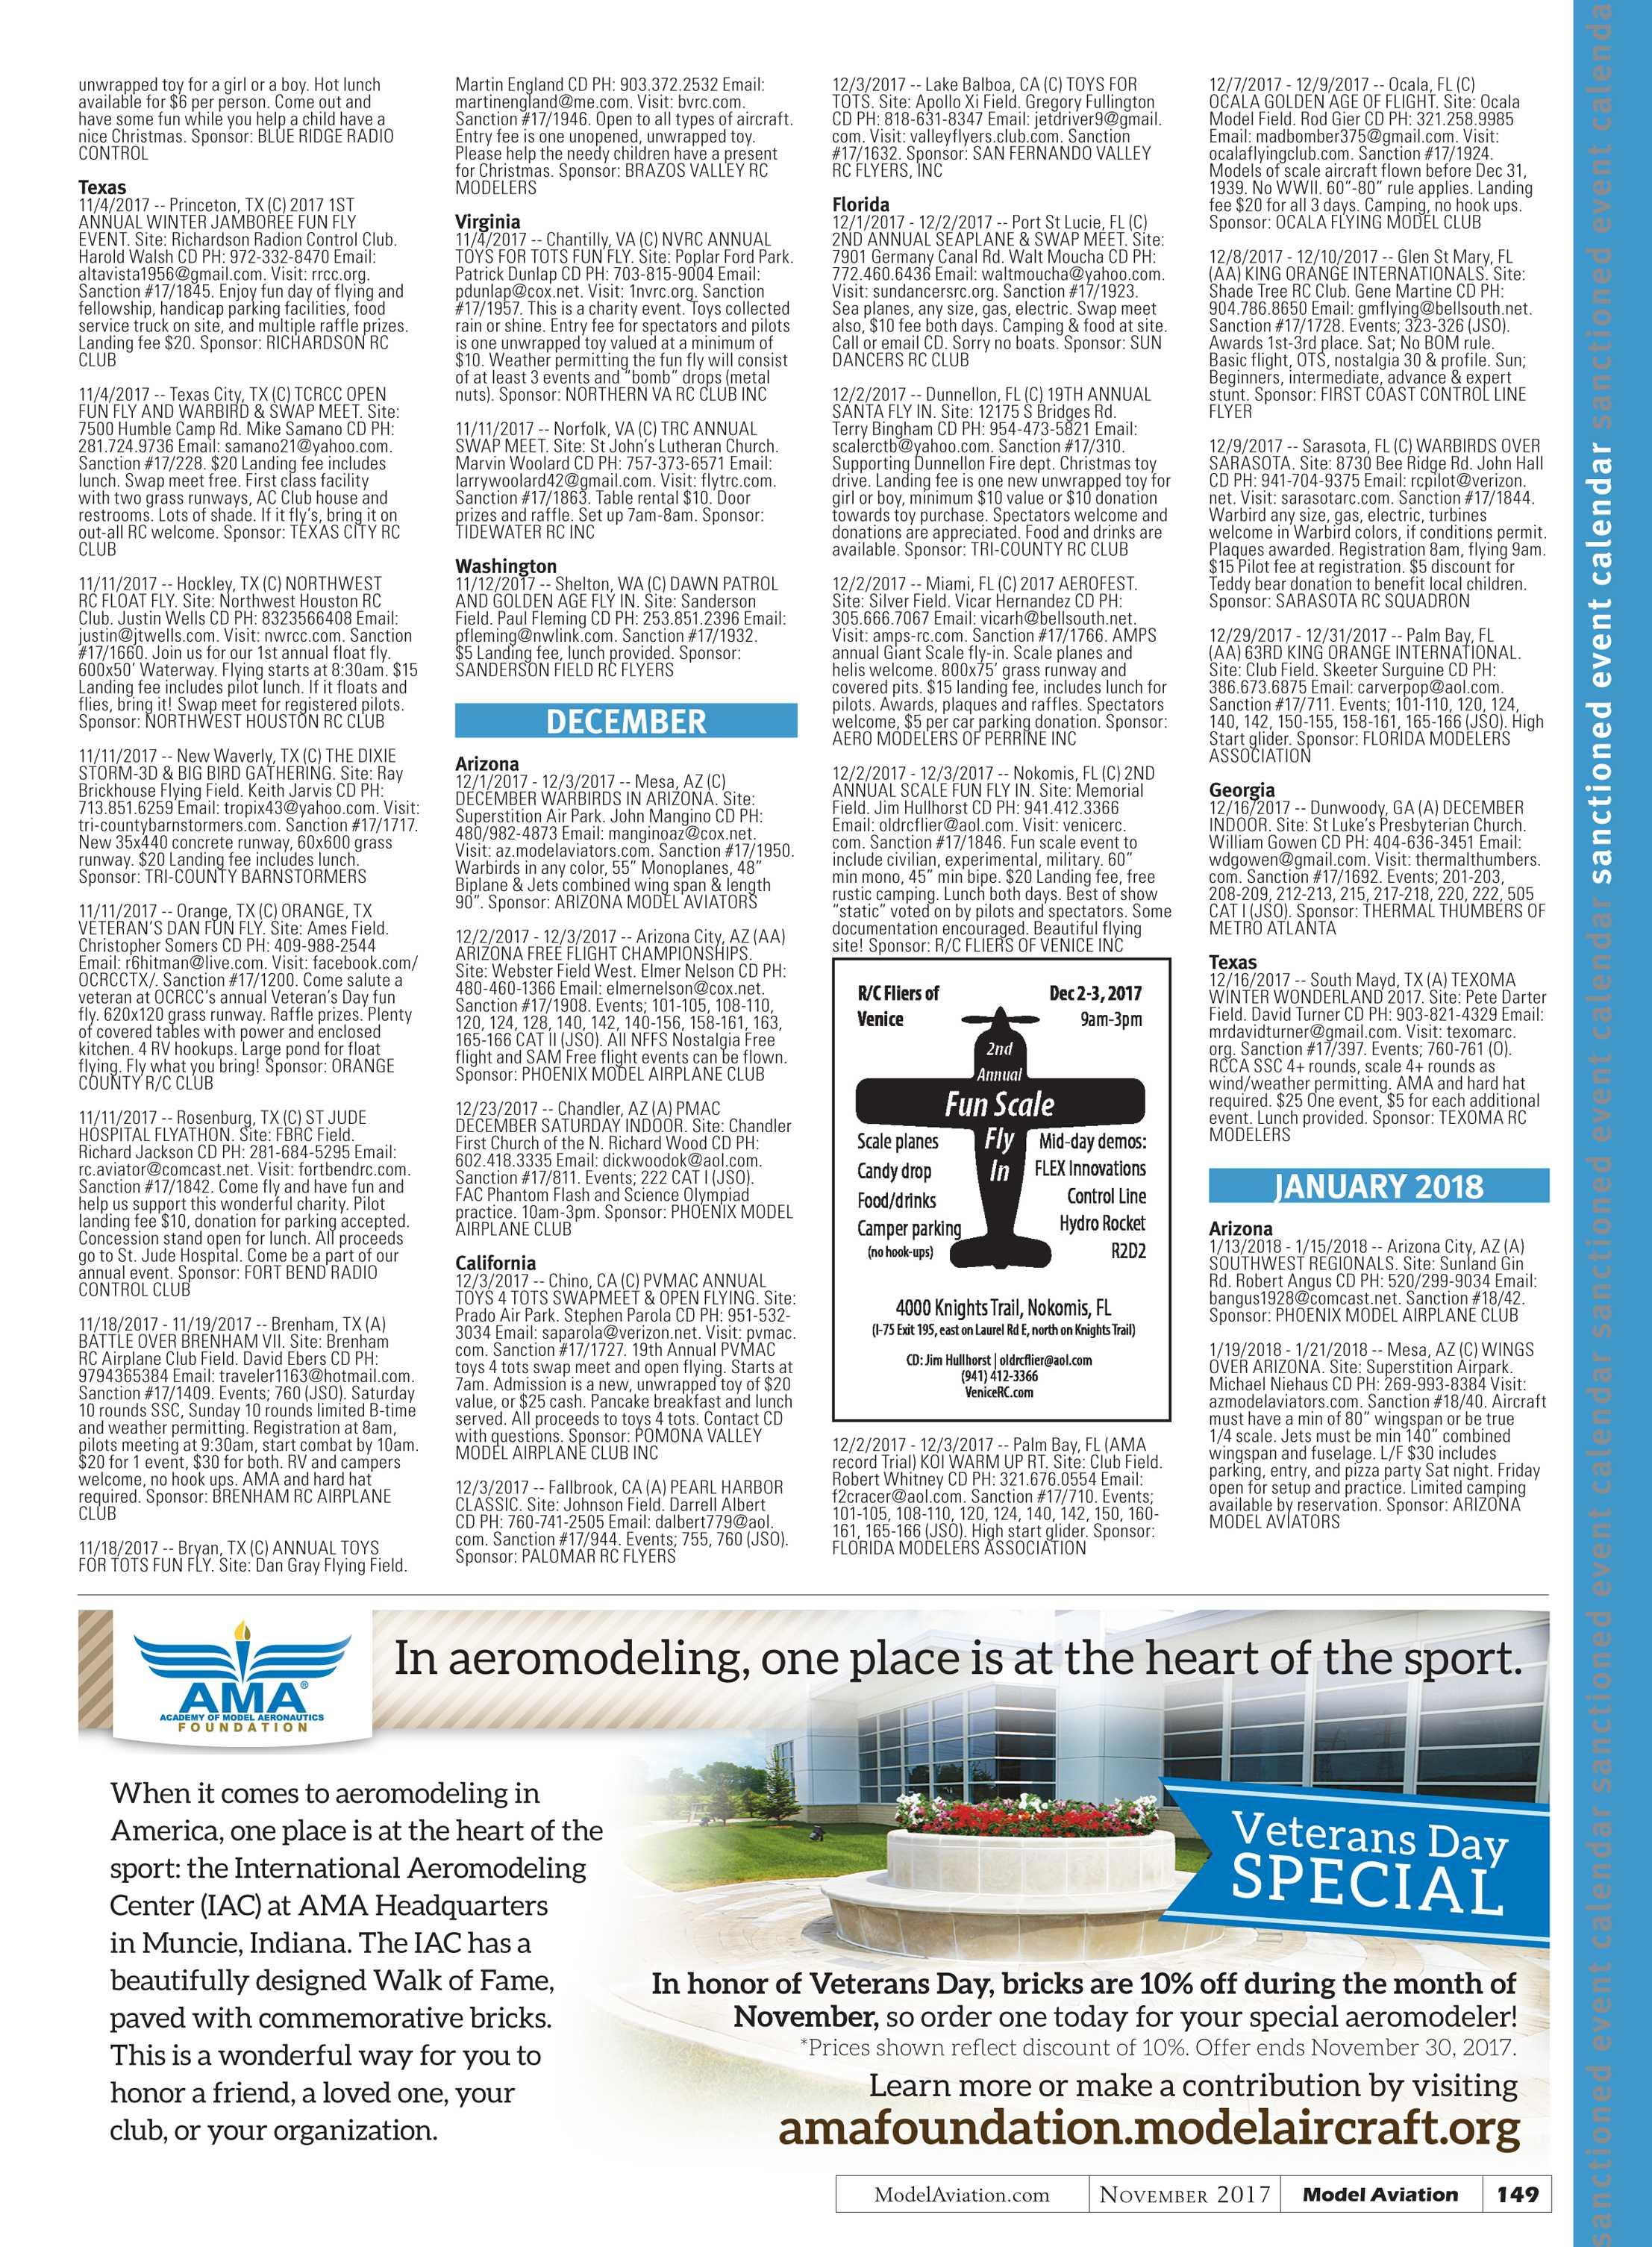 Model Aviation - November 2017 - page 148